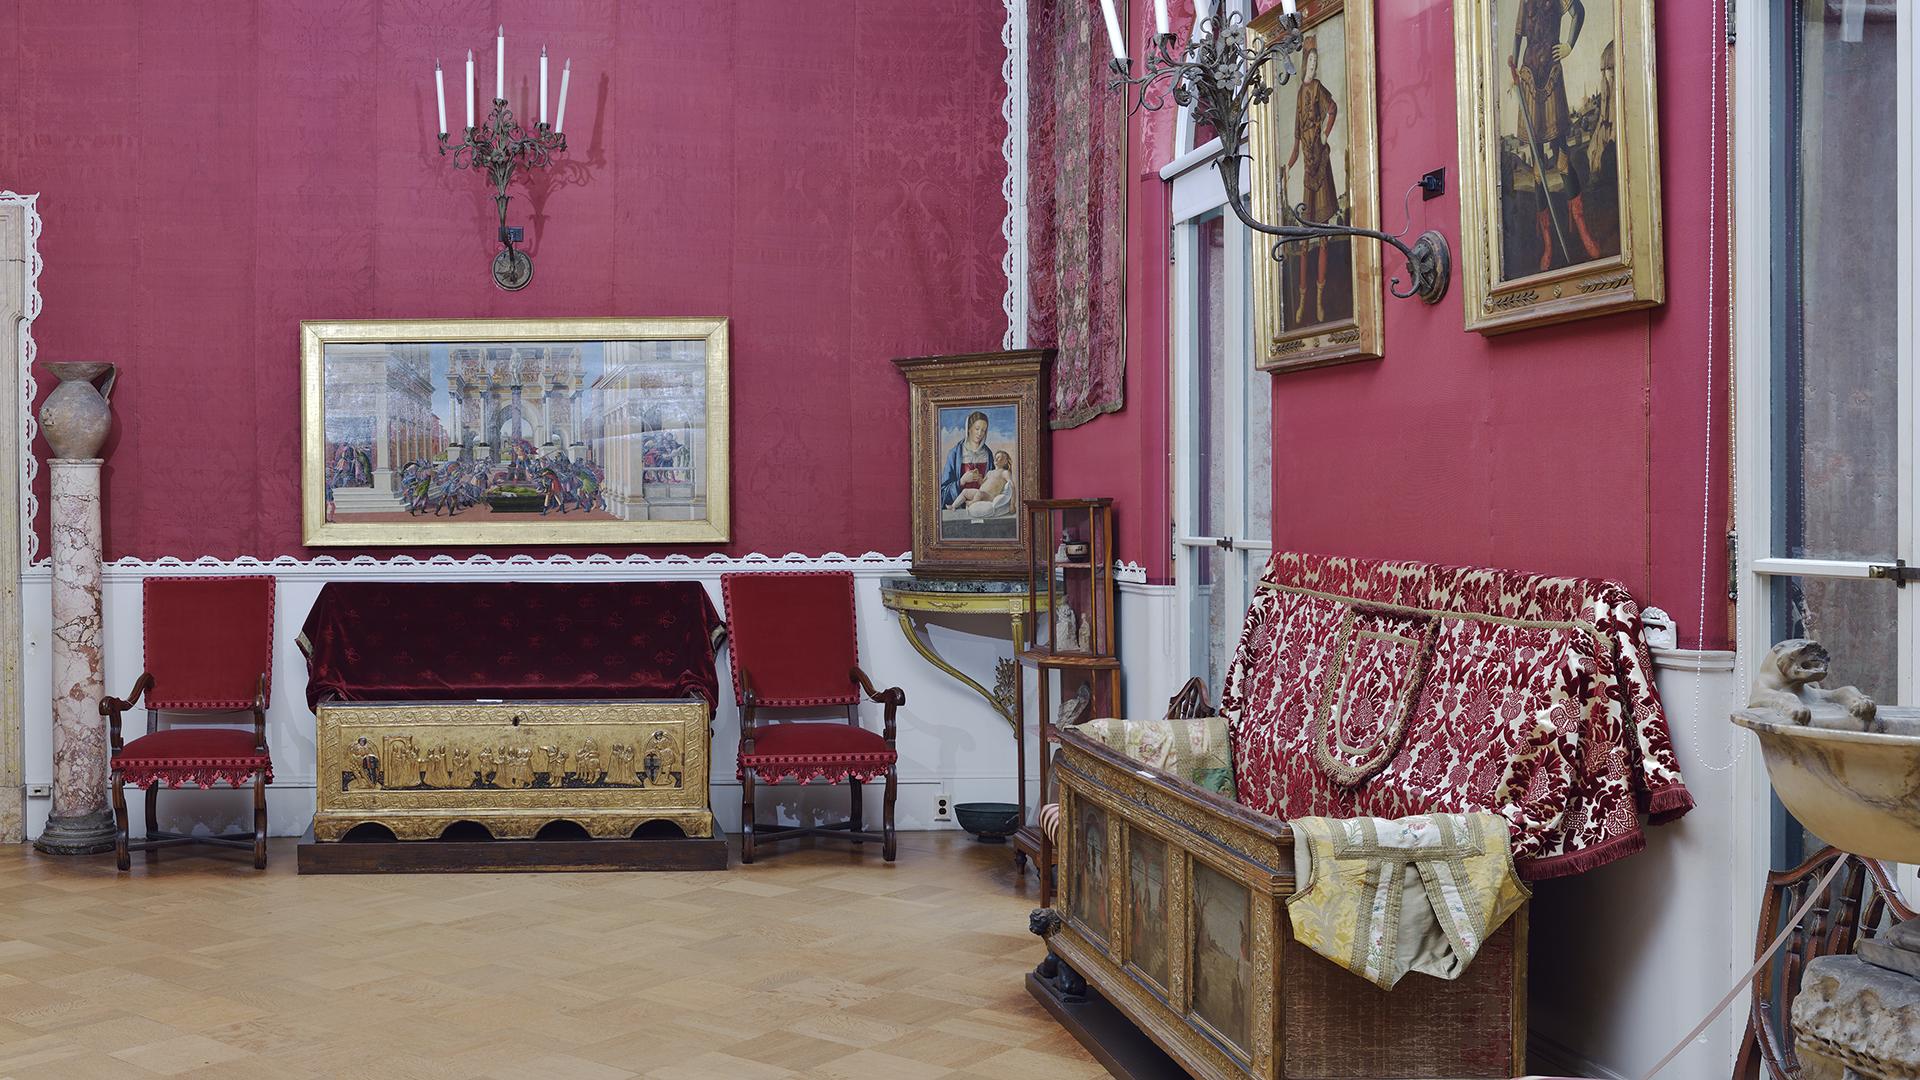 Raphael Room before restoration